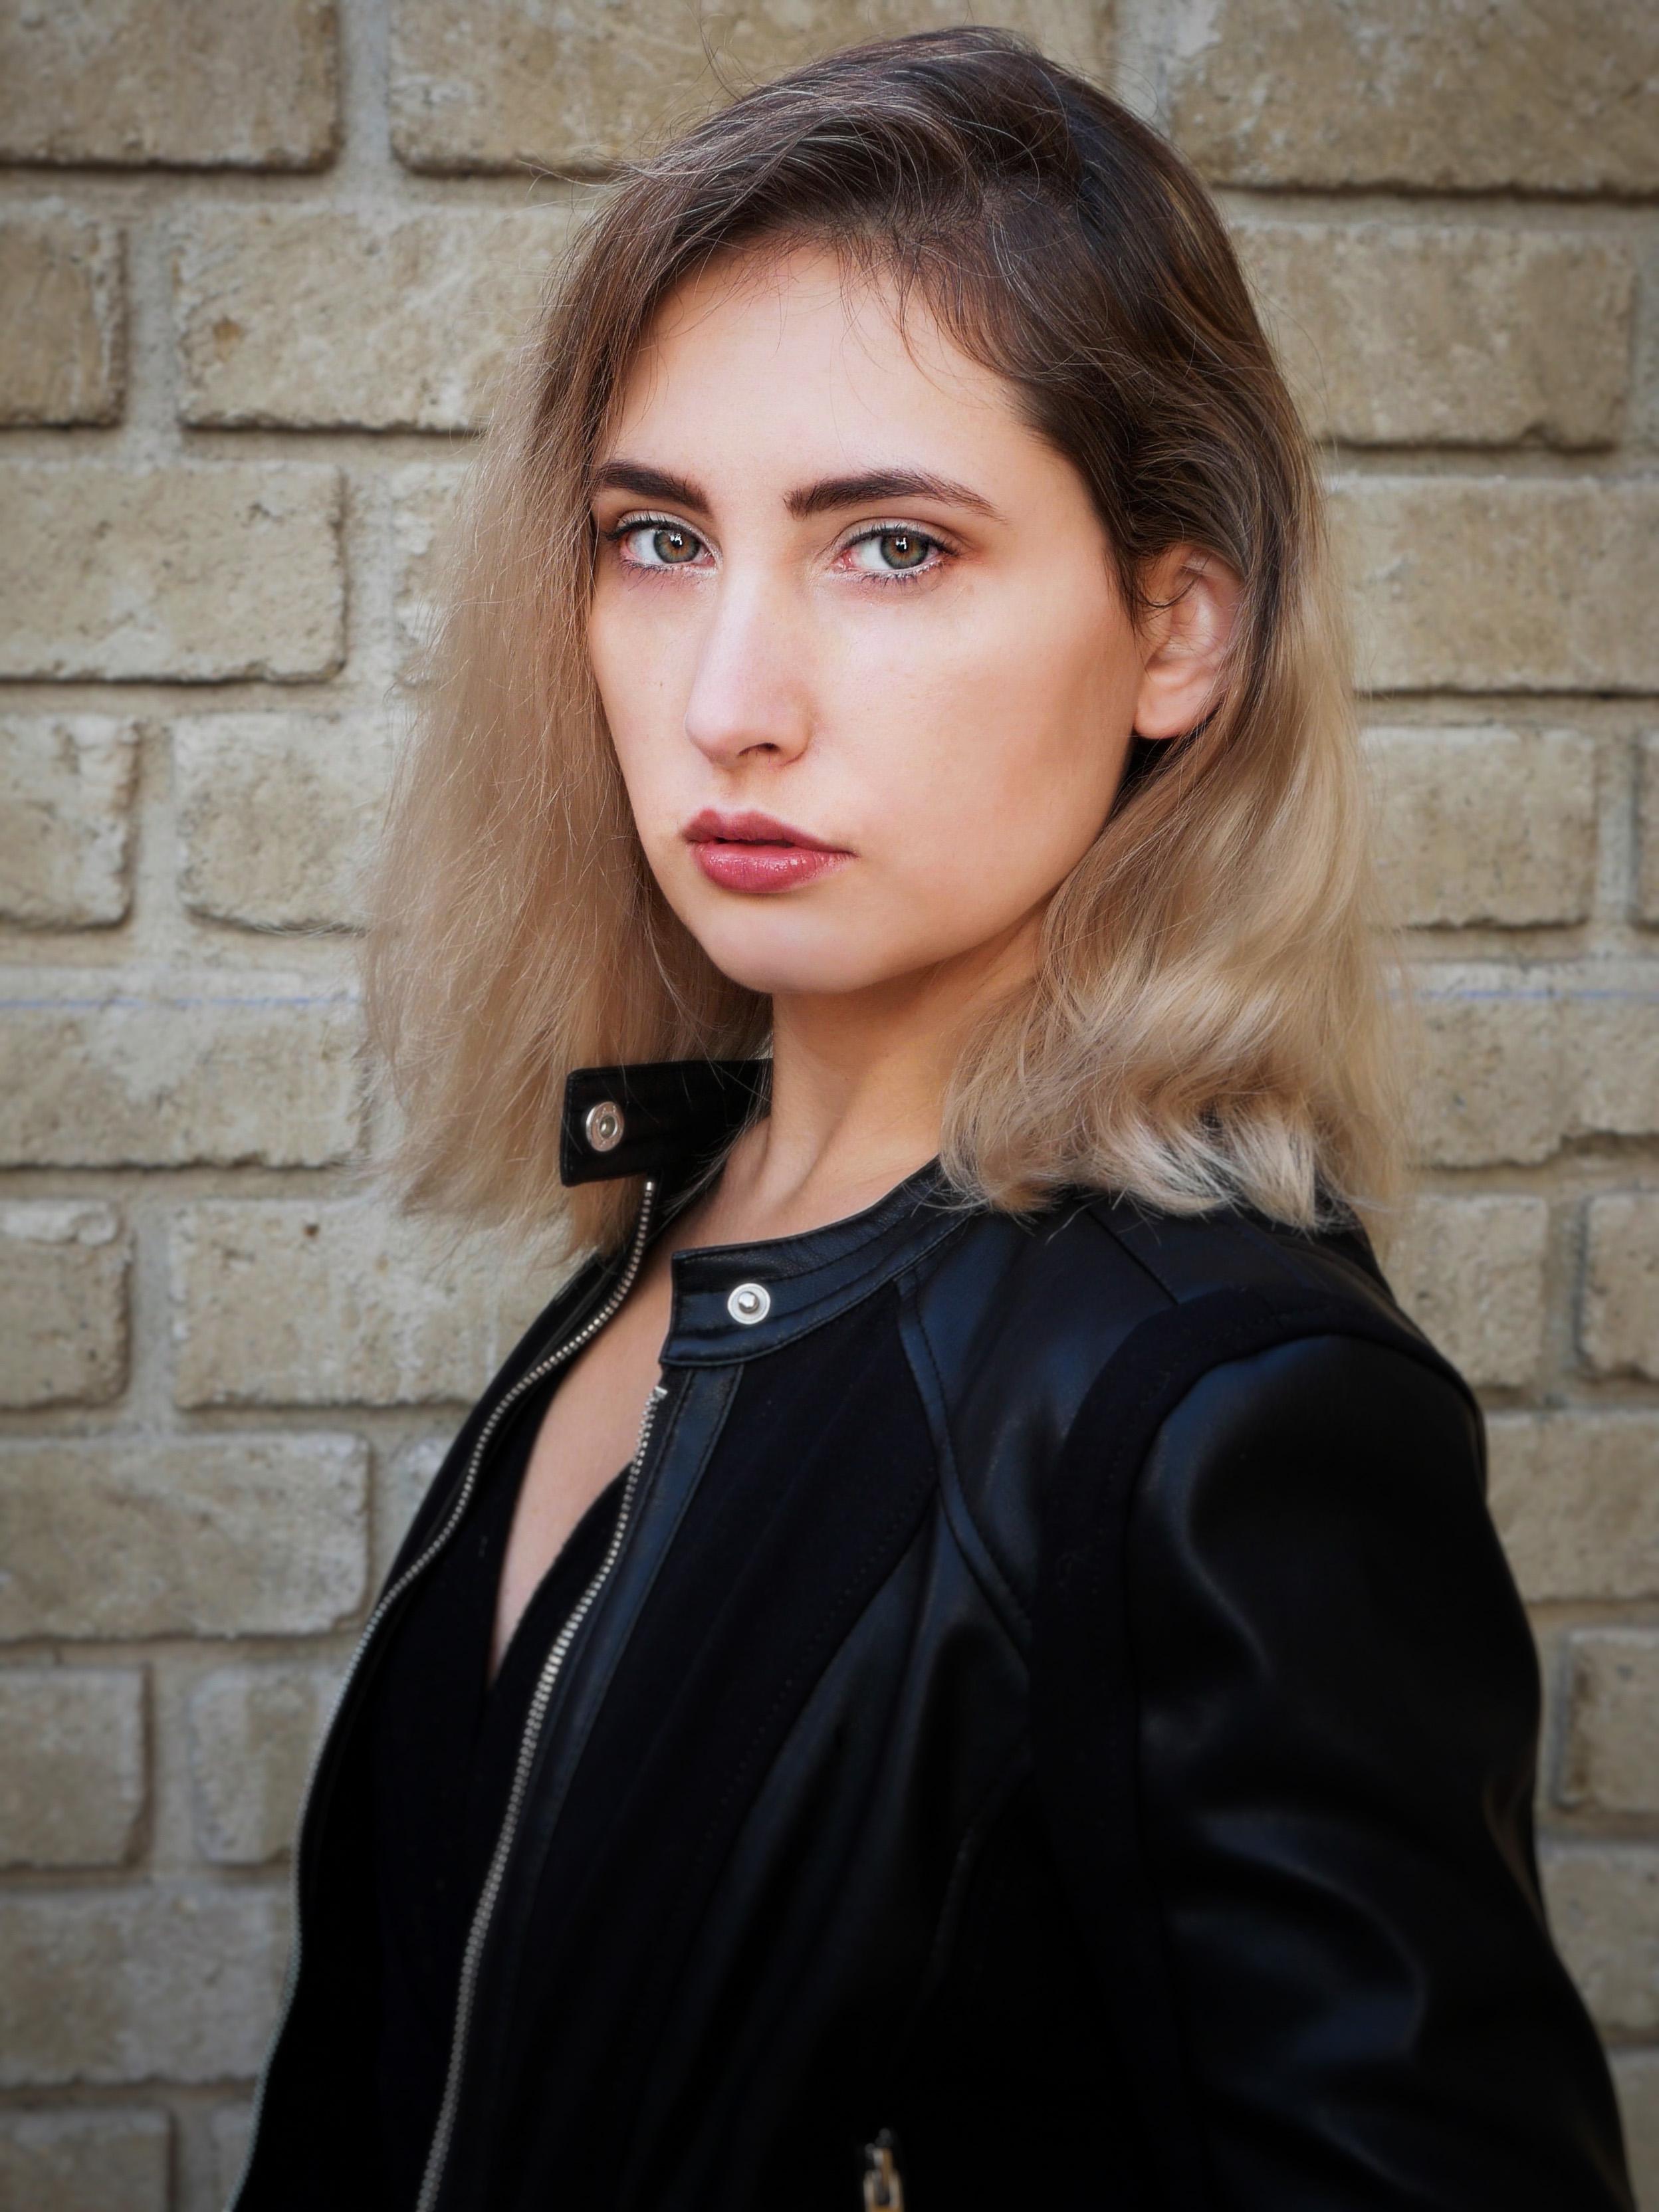 Veronica Nolte